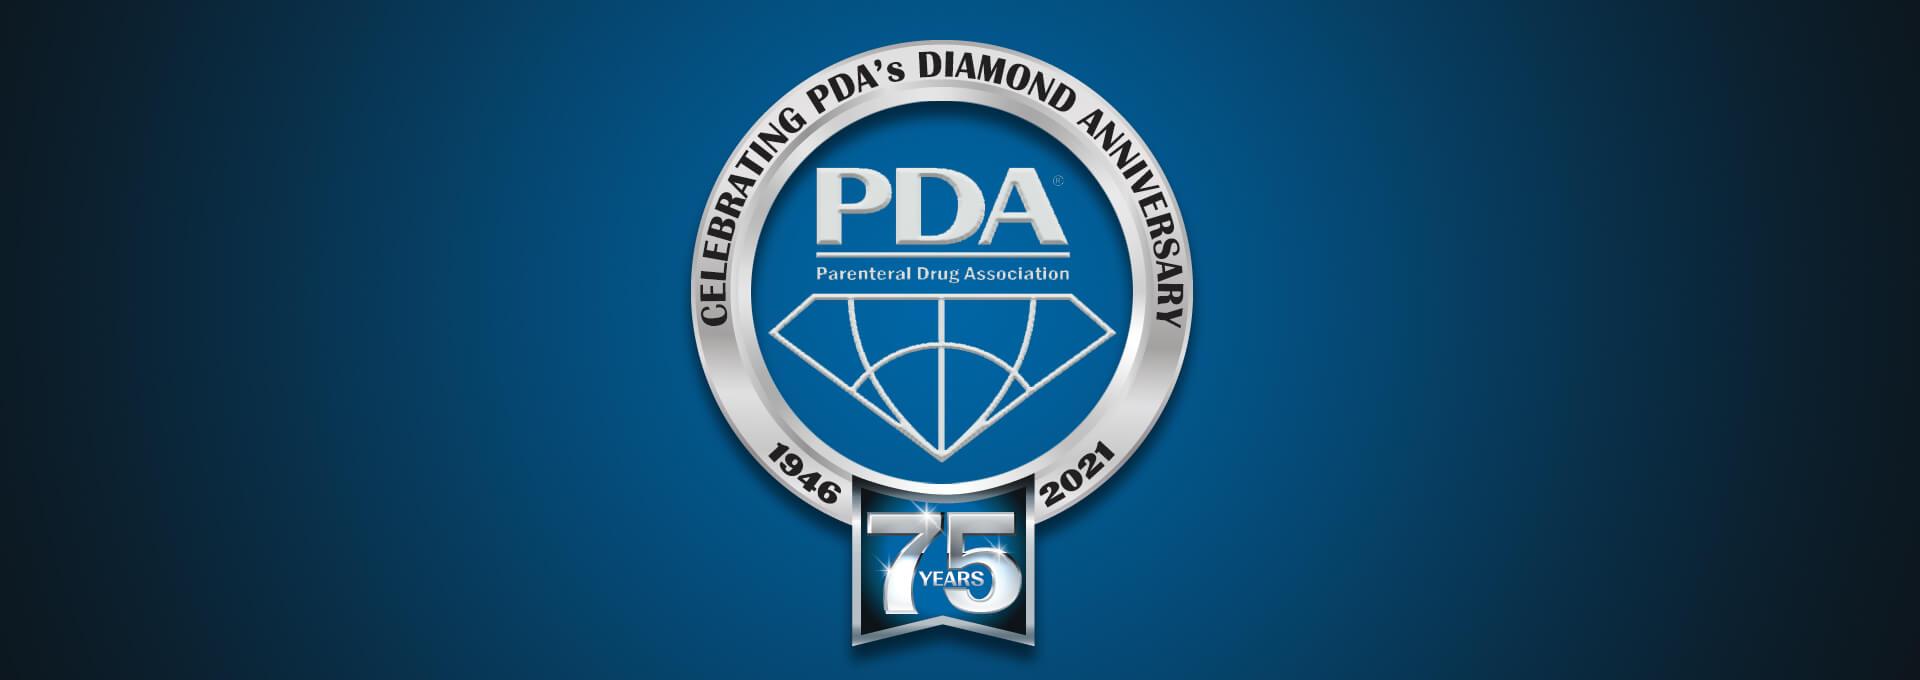 PDA's Honor Awards Program